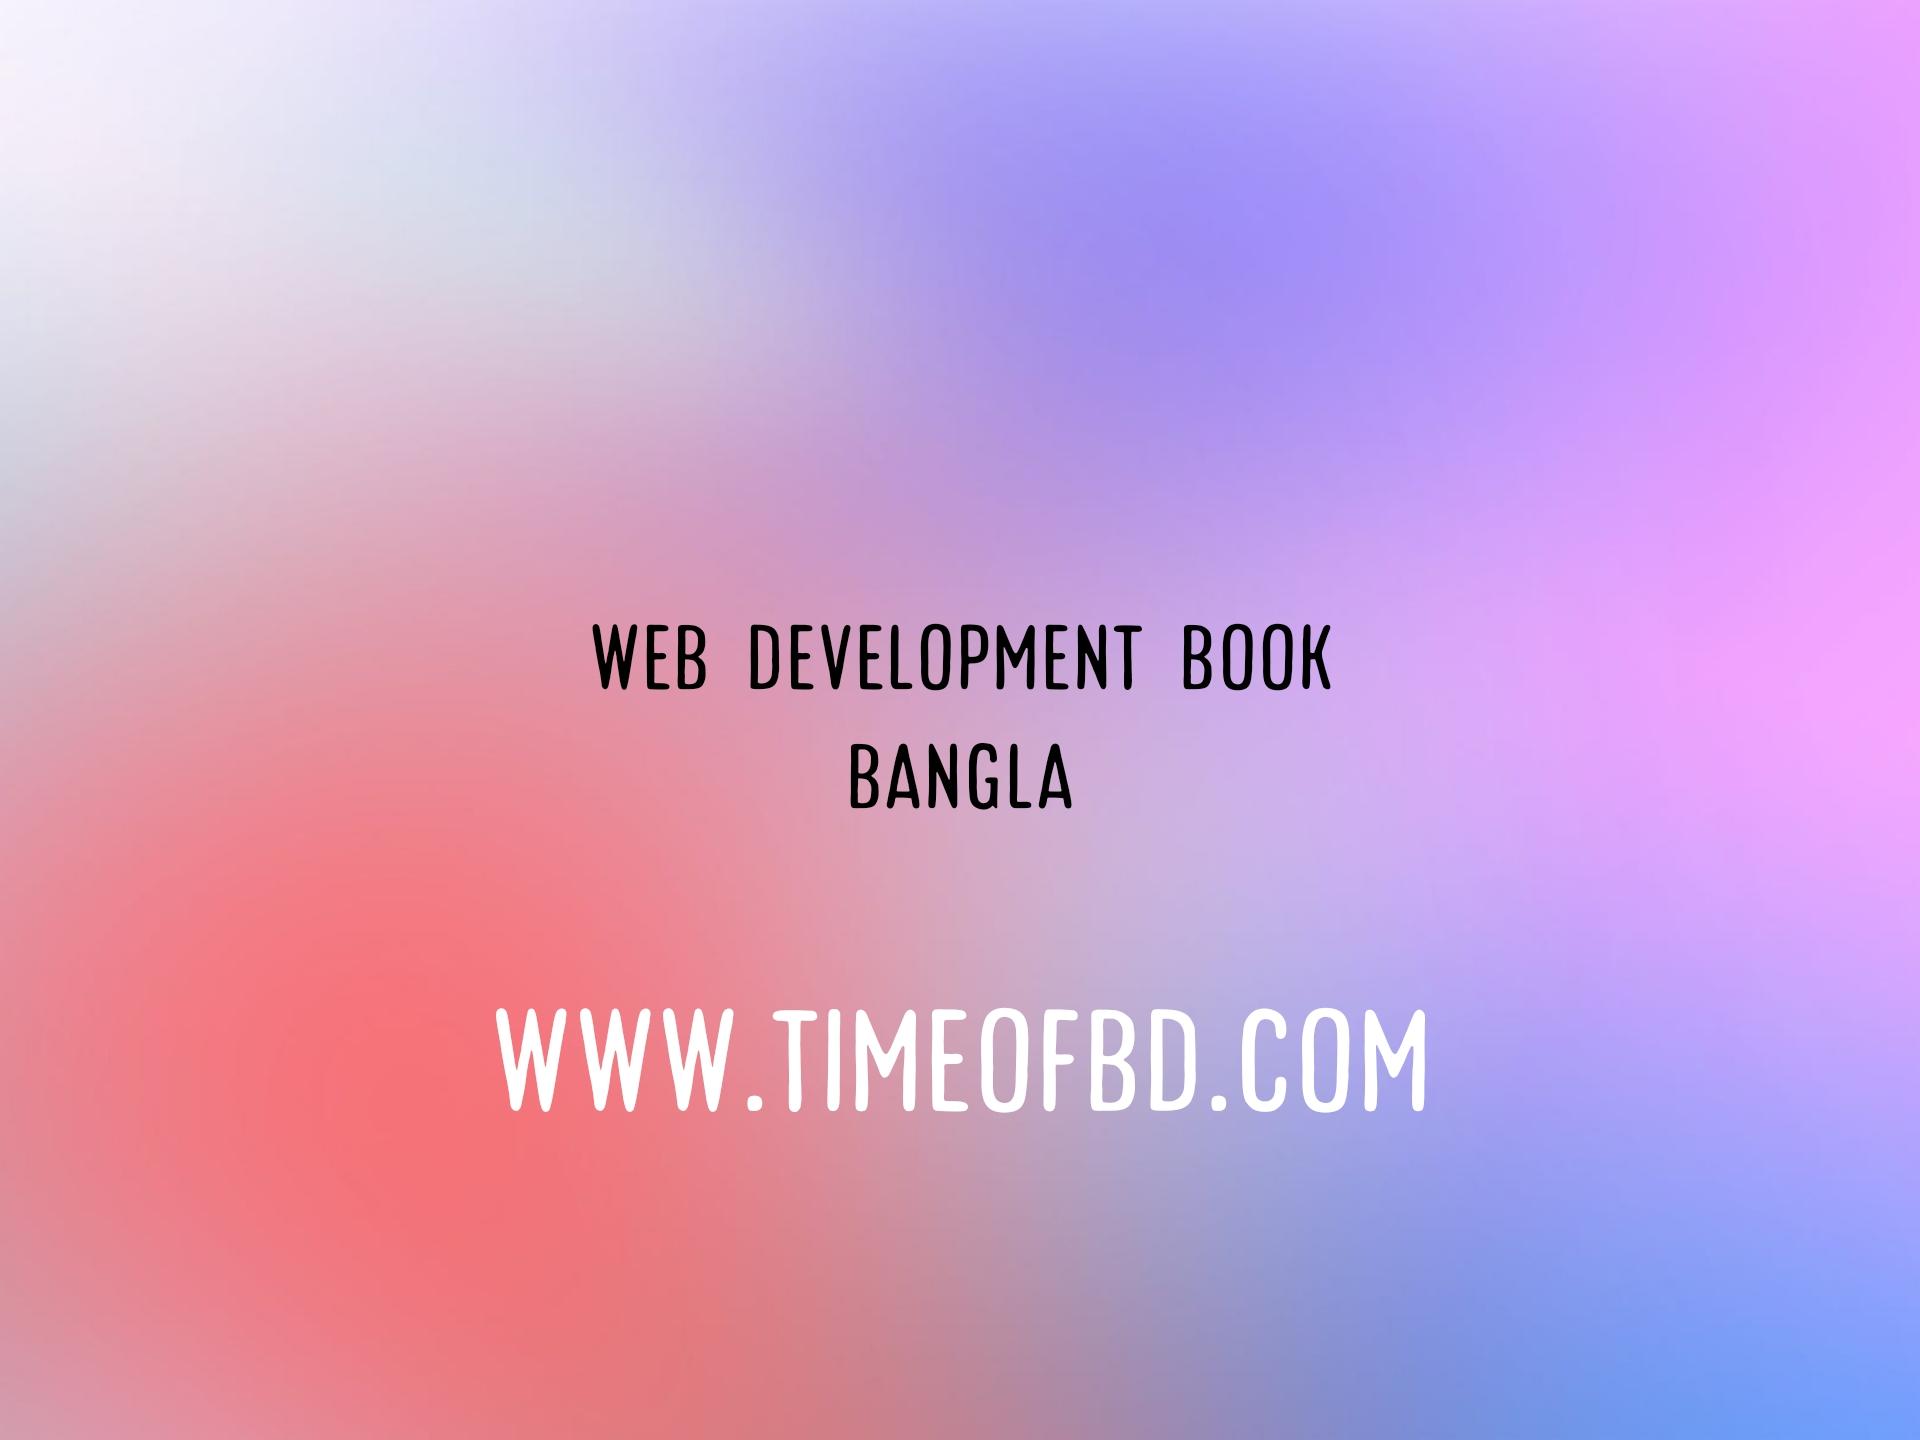 web development book online order link, web development book online order, web development book,web development book pdf online